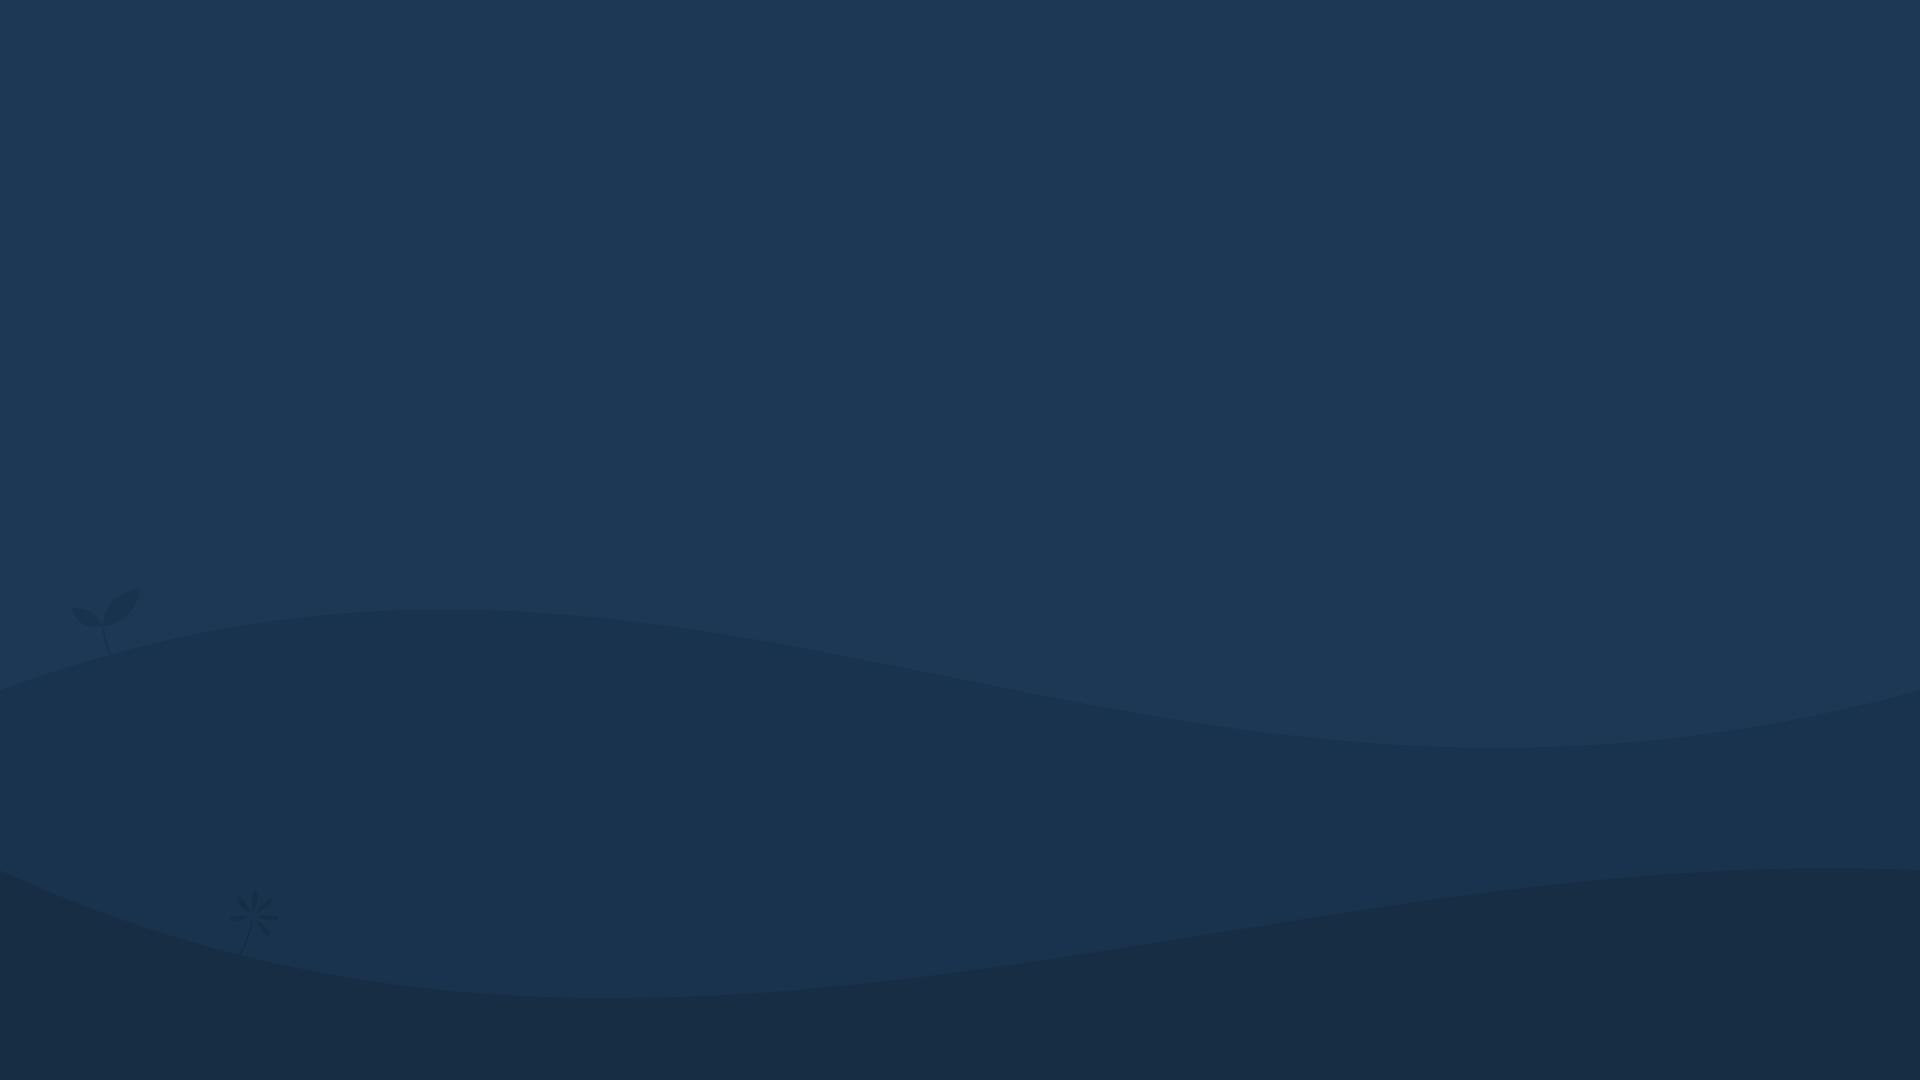 WIP - RetroArch (Vita / PSTV) Explained | PSX-Place